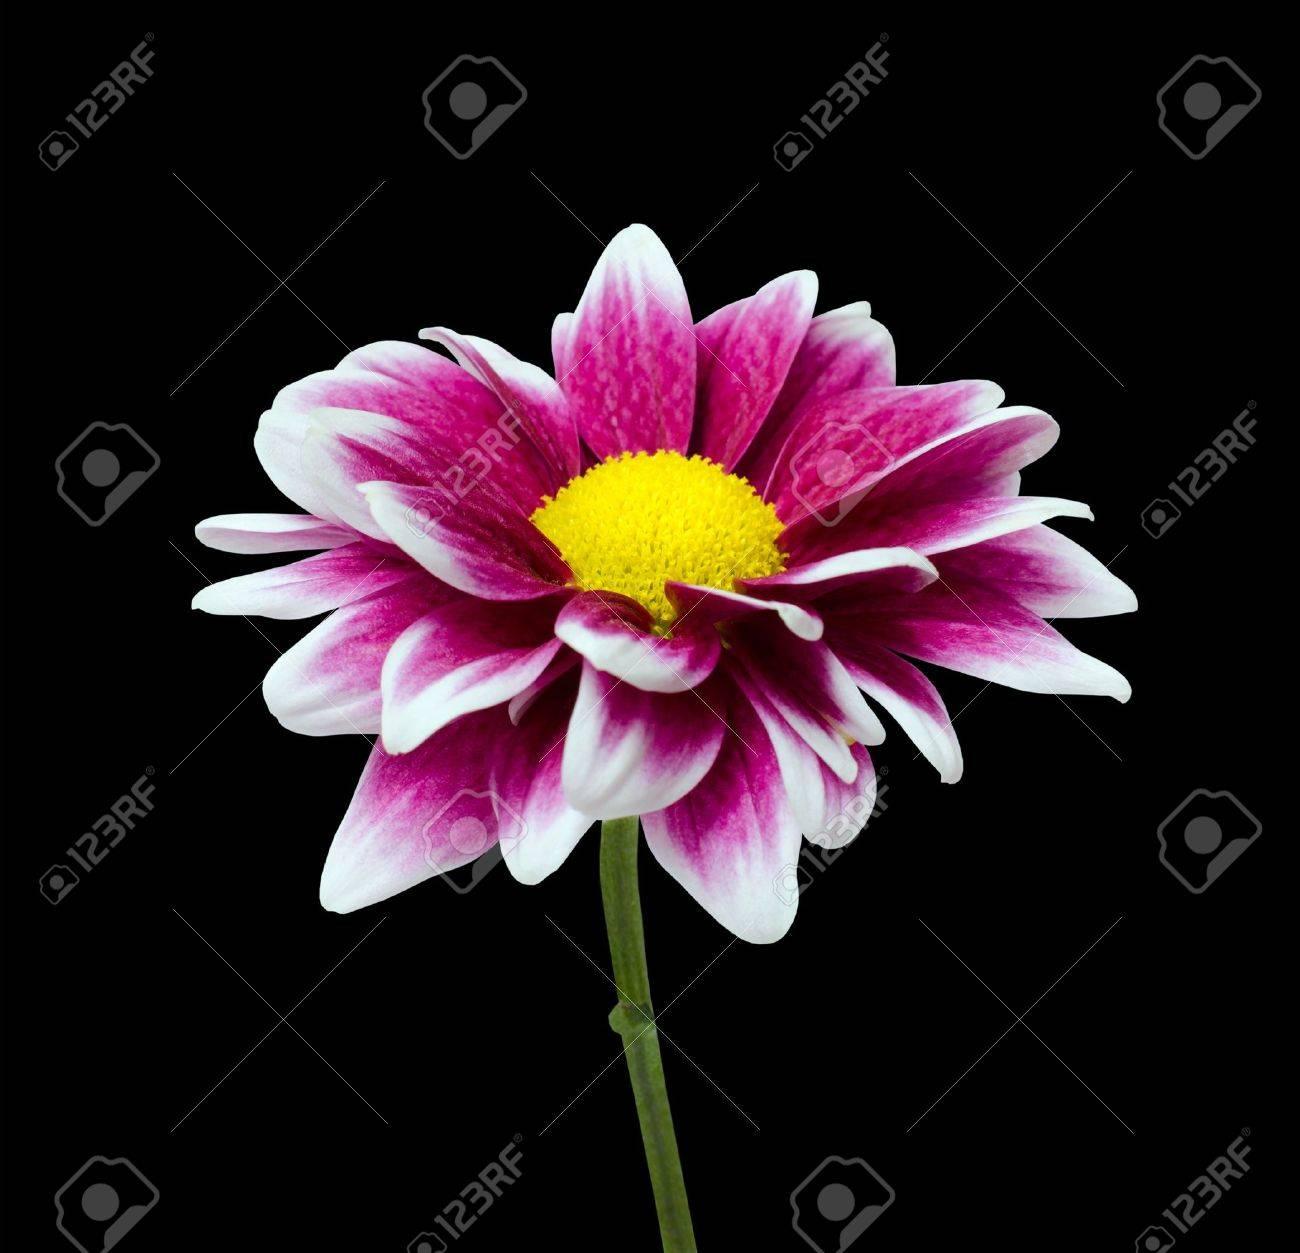 Fresh purple dahlia flower with yellow center isolated on black fresh purple dahlia flower with yellow center isolated on black background stock photo 14660708 izmirmasajfo